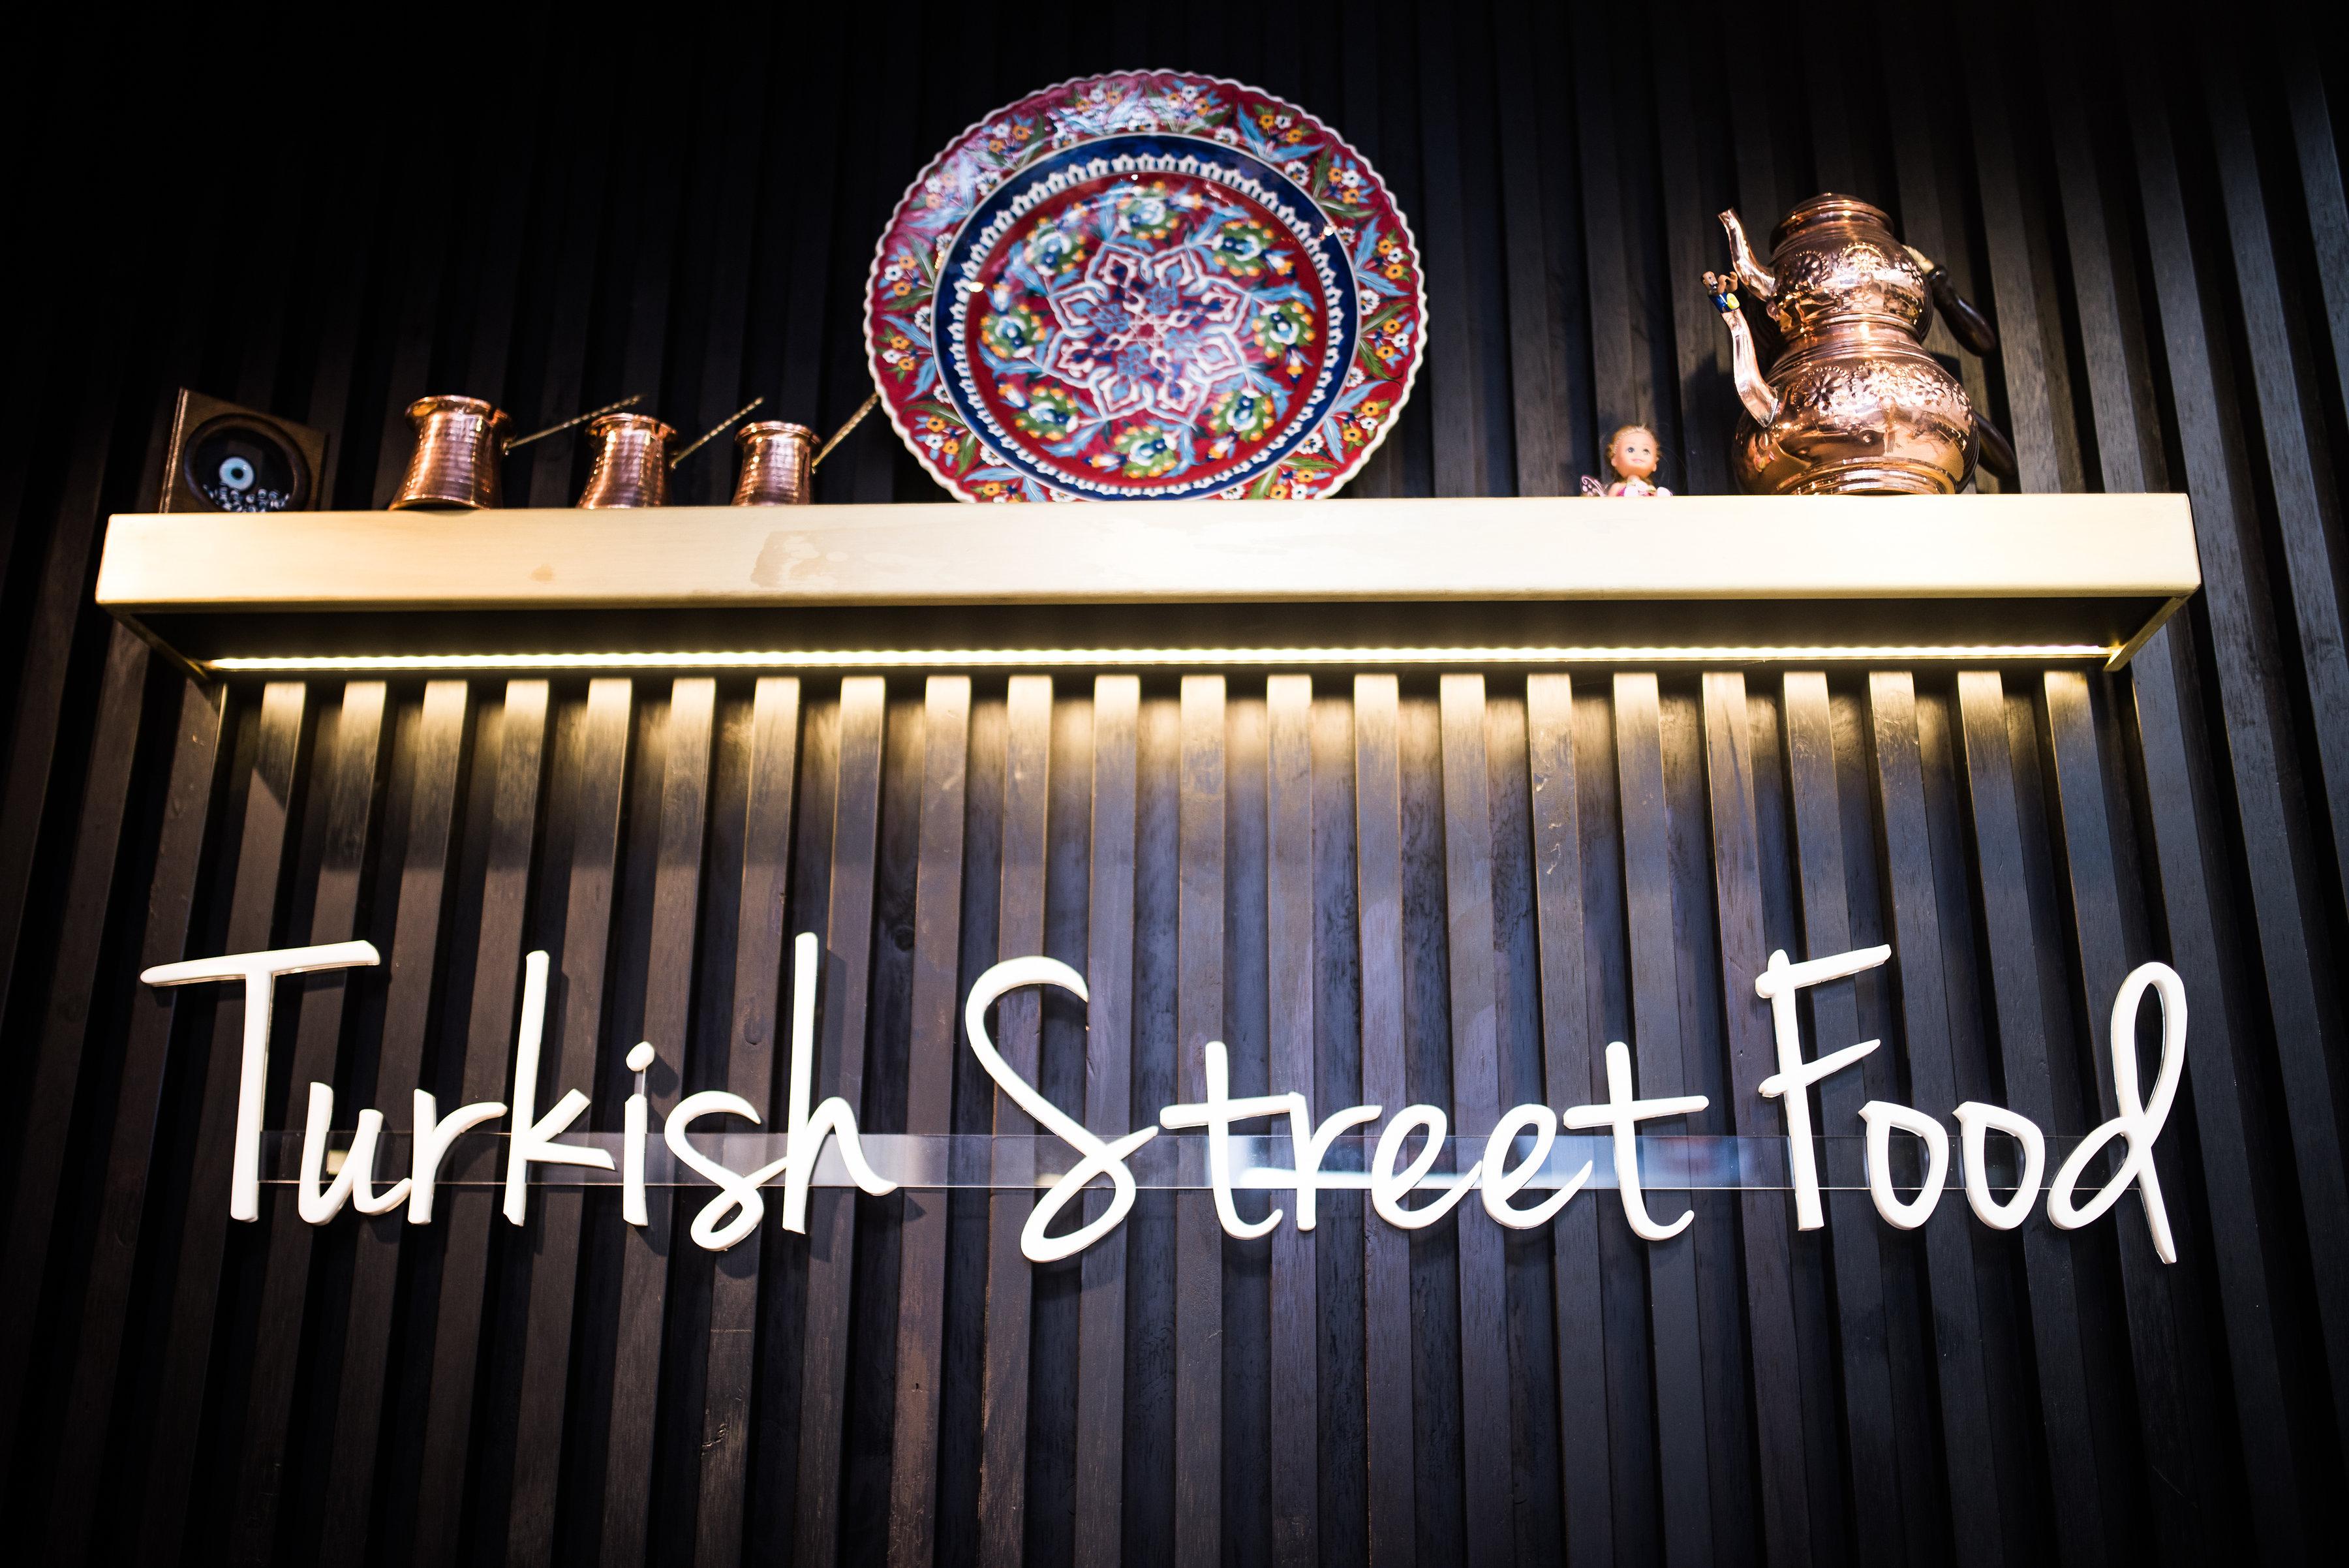 healthy-fresh-fast-gozleme-king-australias-premier-turkish-street-food-2